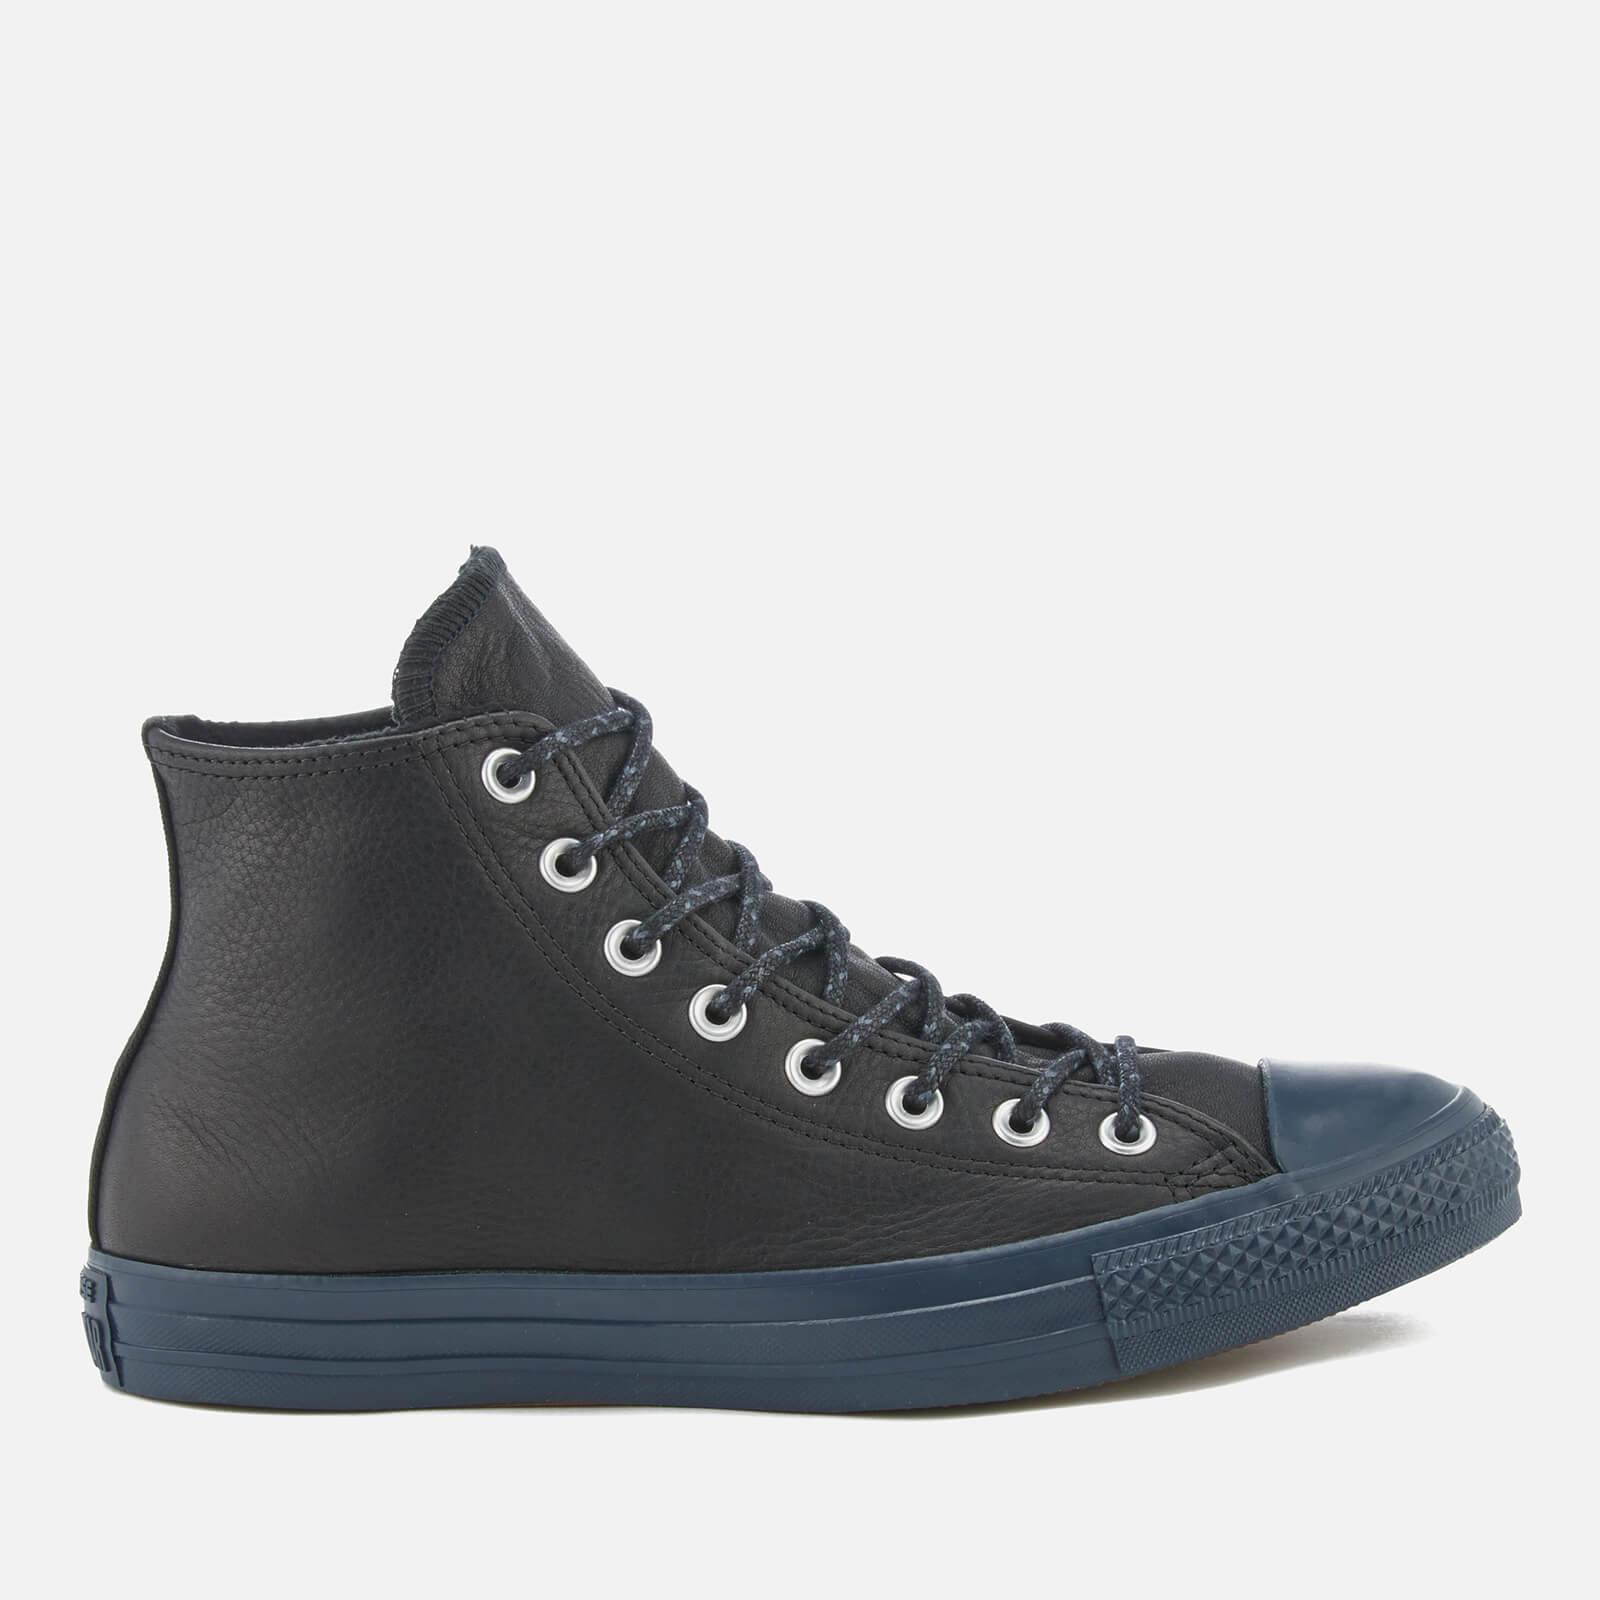 cb3101da62ff Converse Men s Chuck Taylor All Star Hi-Top Trainers - Black Black Sharkskin  Clothing